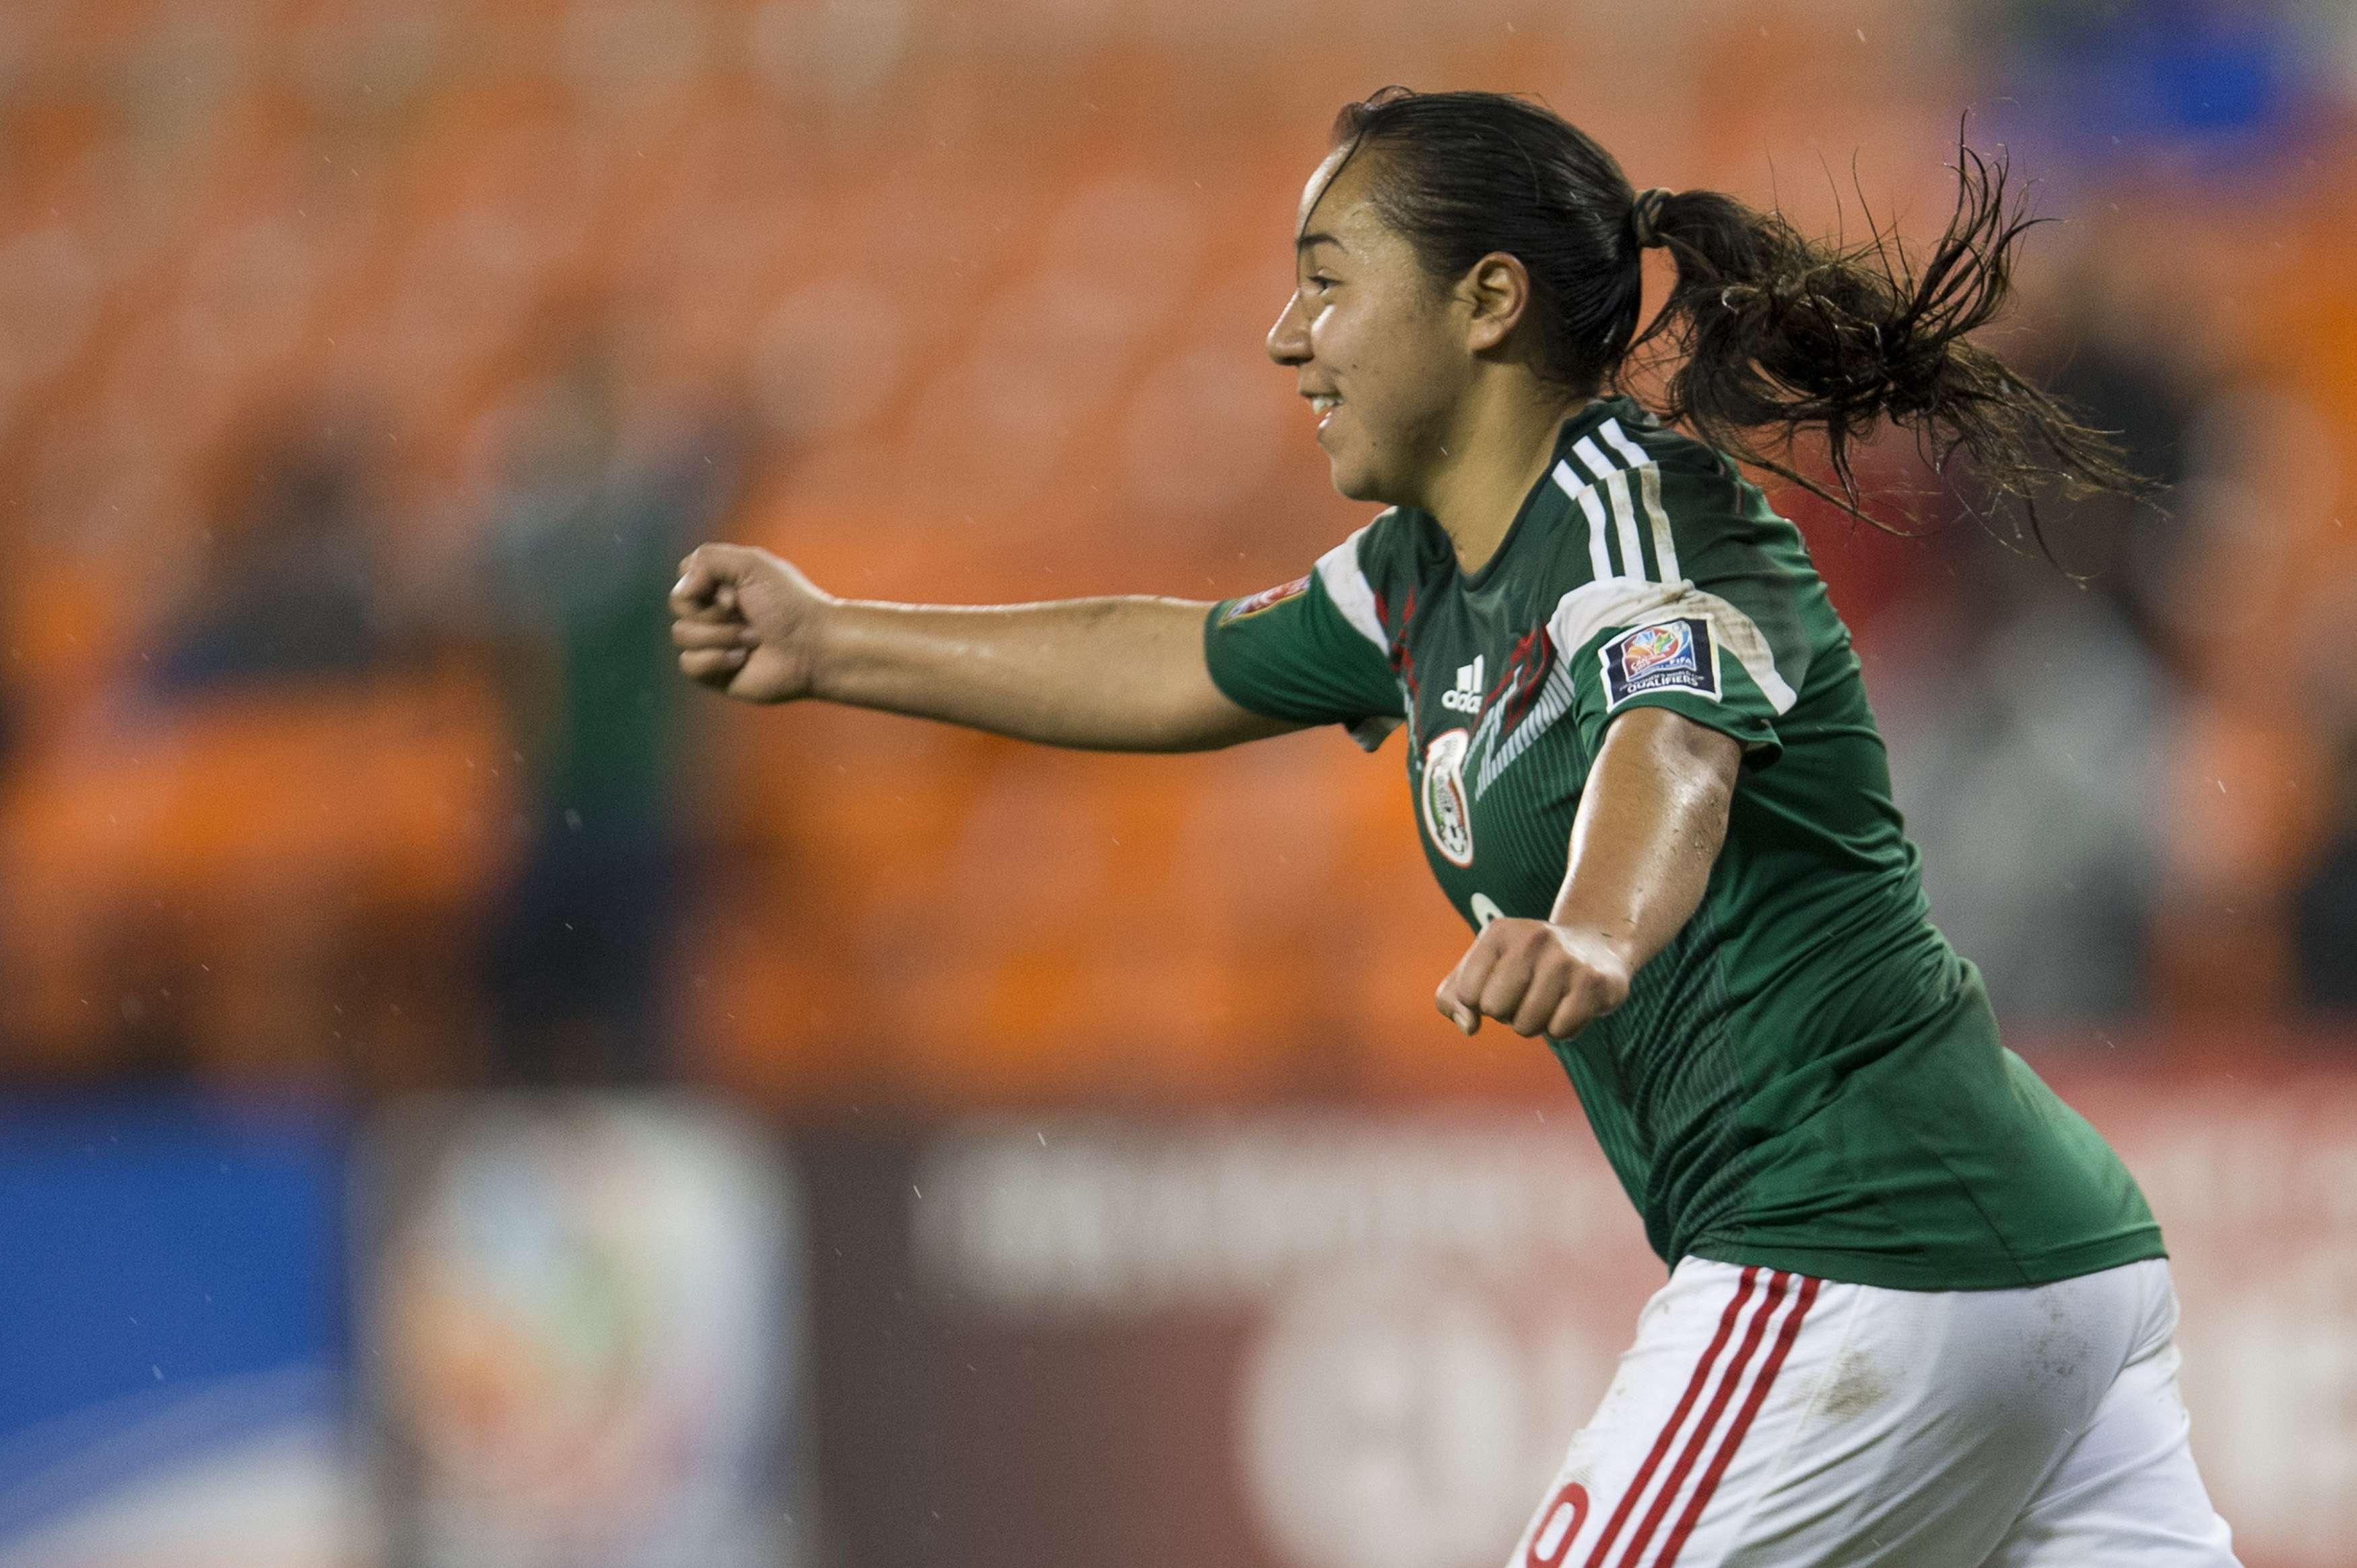 México si derrota a Estados Unidos está en el mundial Foto: Mexsport